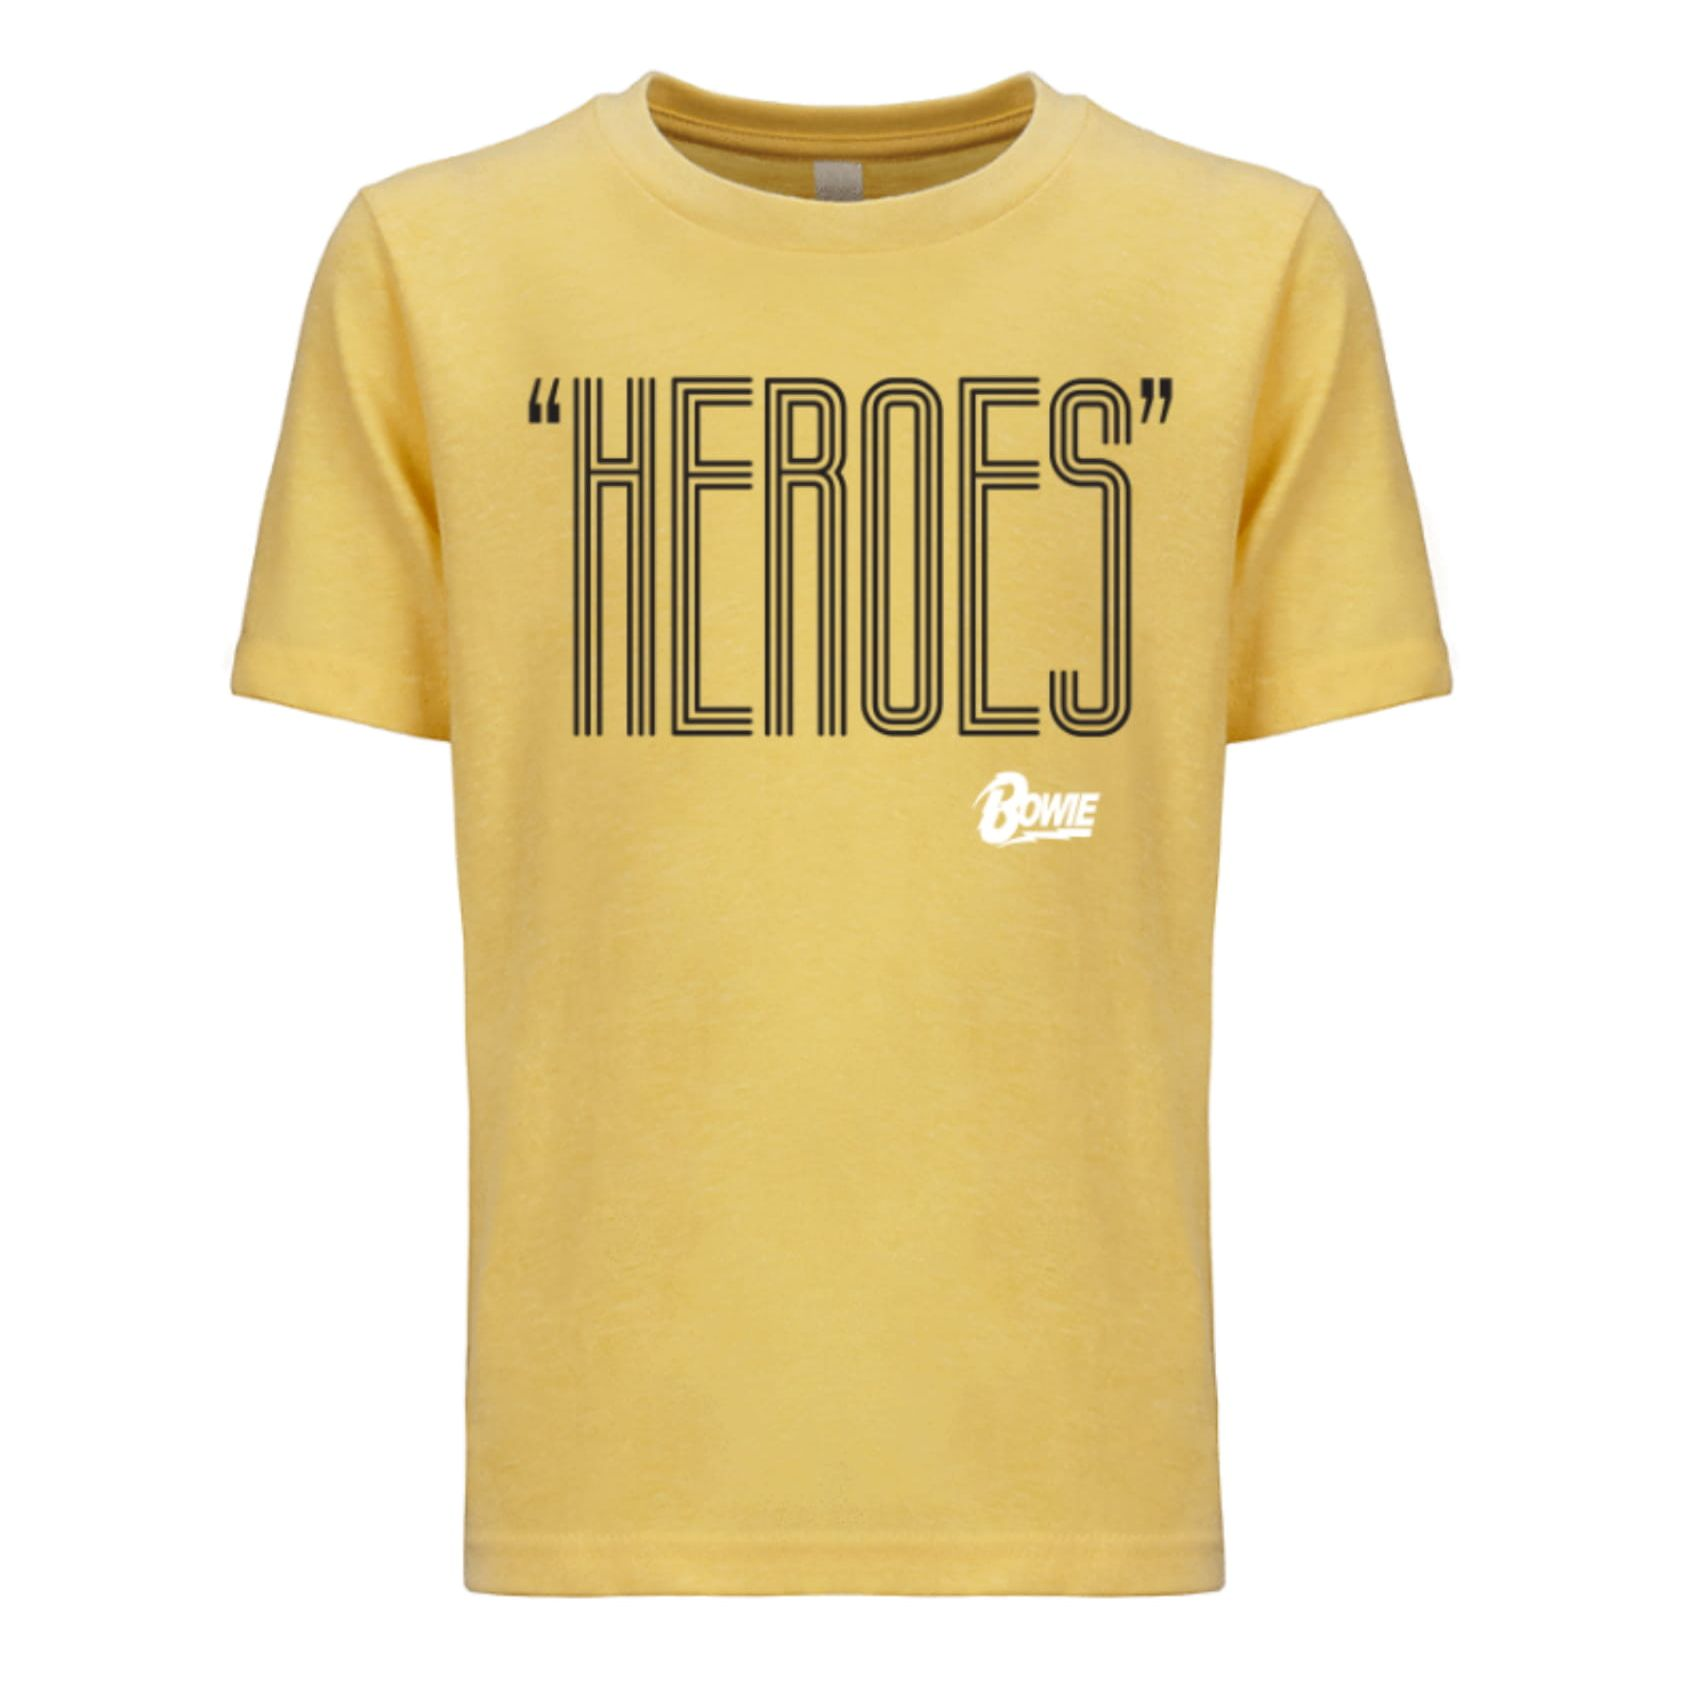 Heroes Black/White Youth Tee